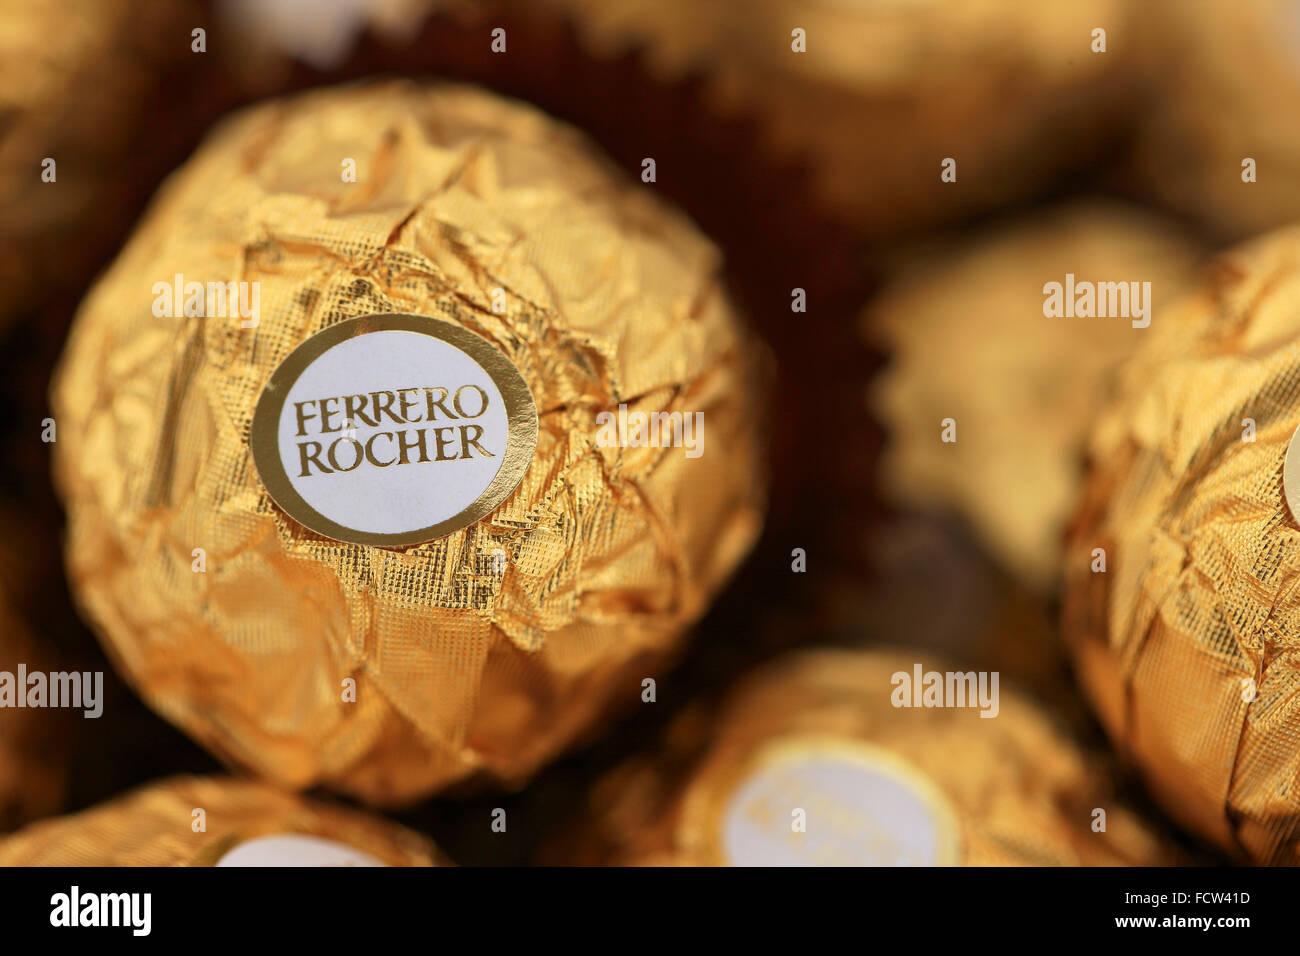 Ferrero Rocher chocolates Stock Photo